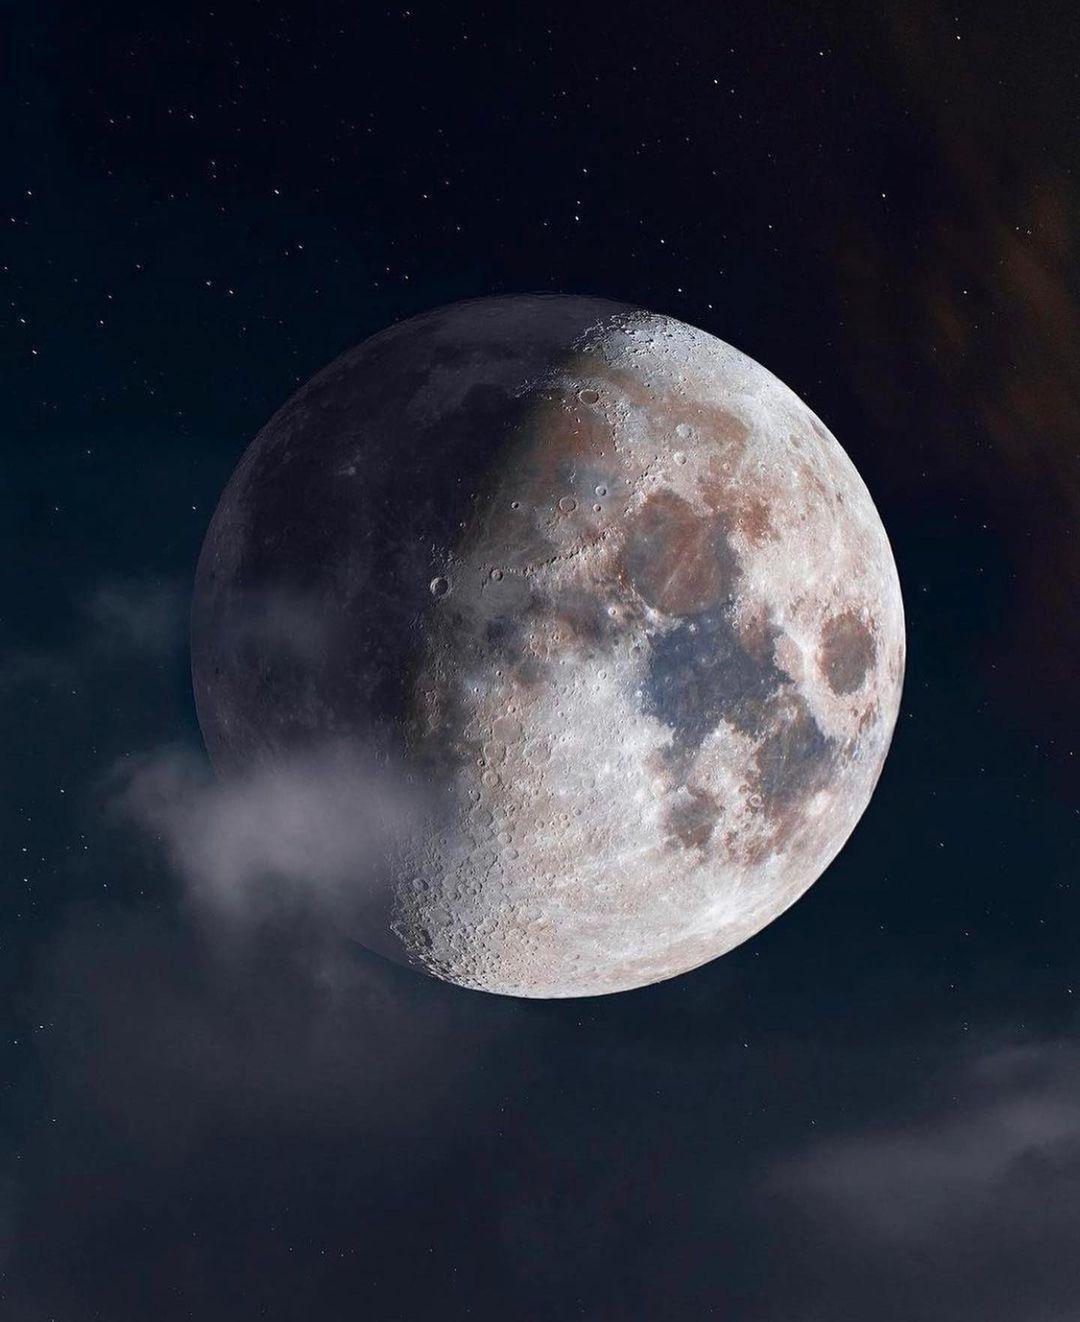 Moon DP for WhatsApp Profile